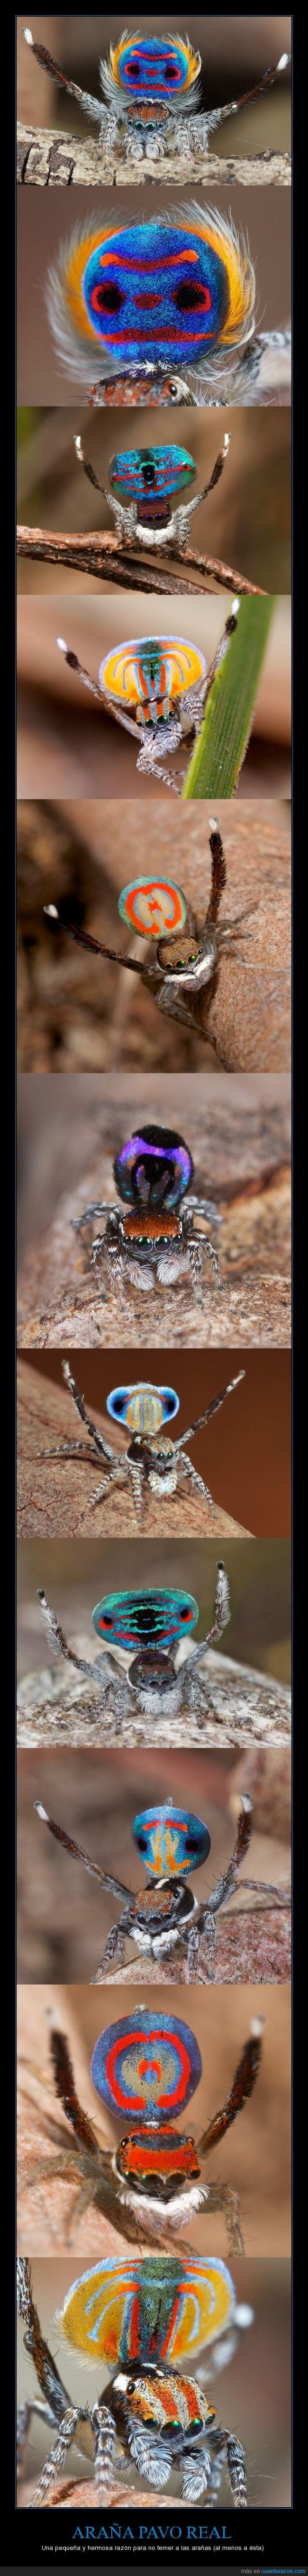 Araña Pavo Real,Arañas,Australia,Danza para atraer a su pareja,Hermosa,Muy pequeña